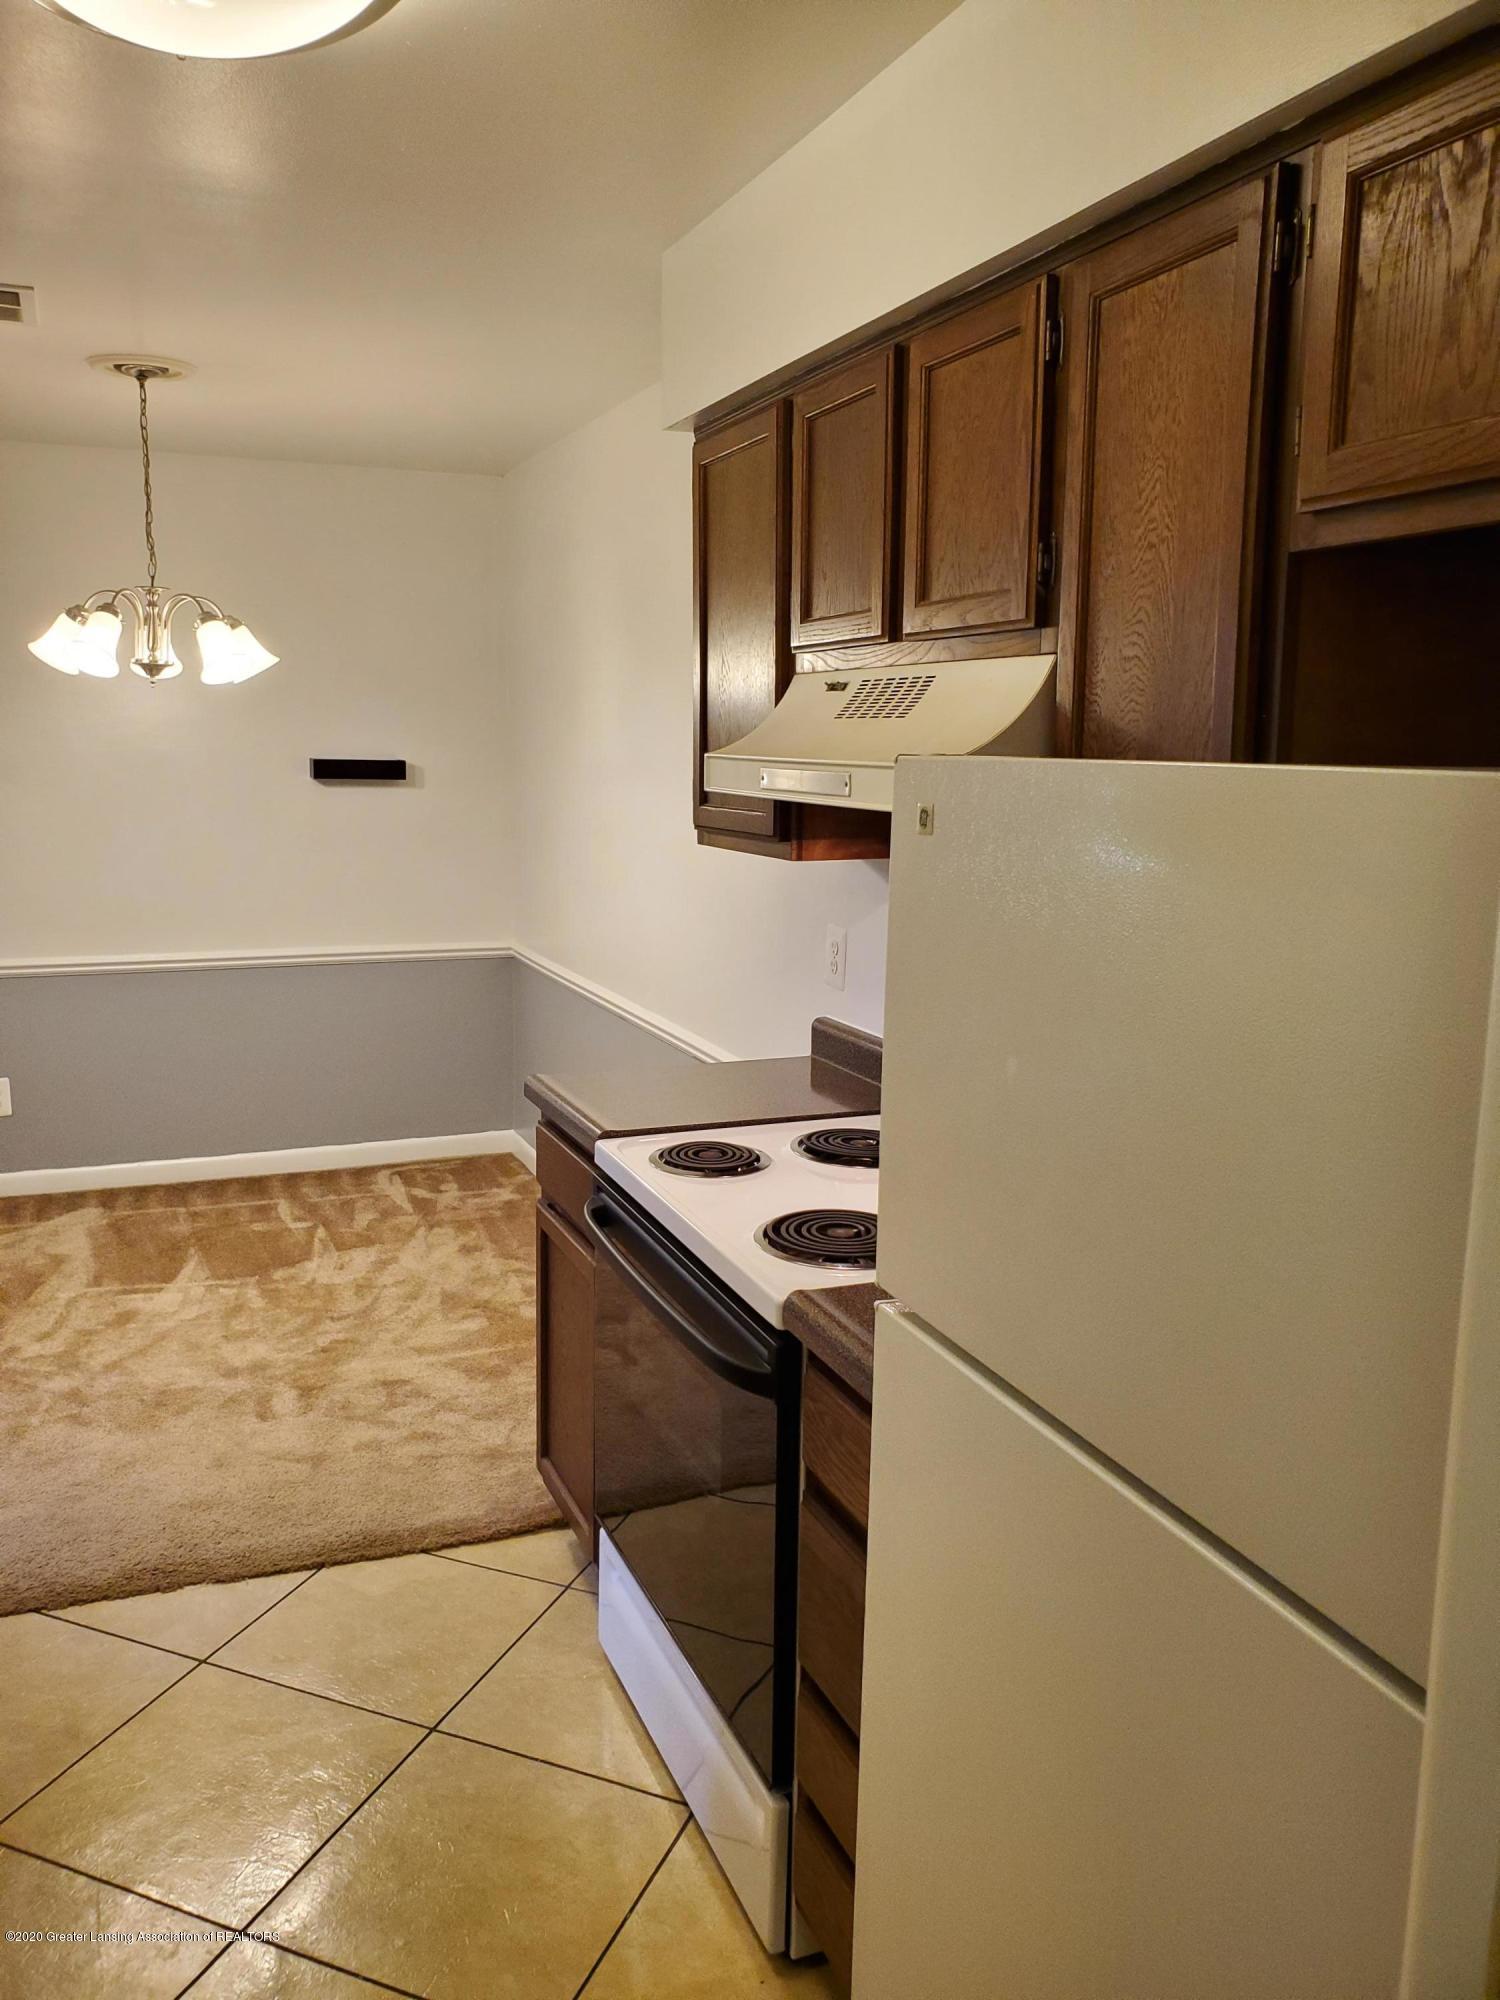 6160 Innkeepers Ct APT 55 - Kitchen/Dining - 5